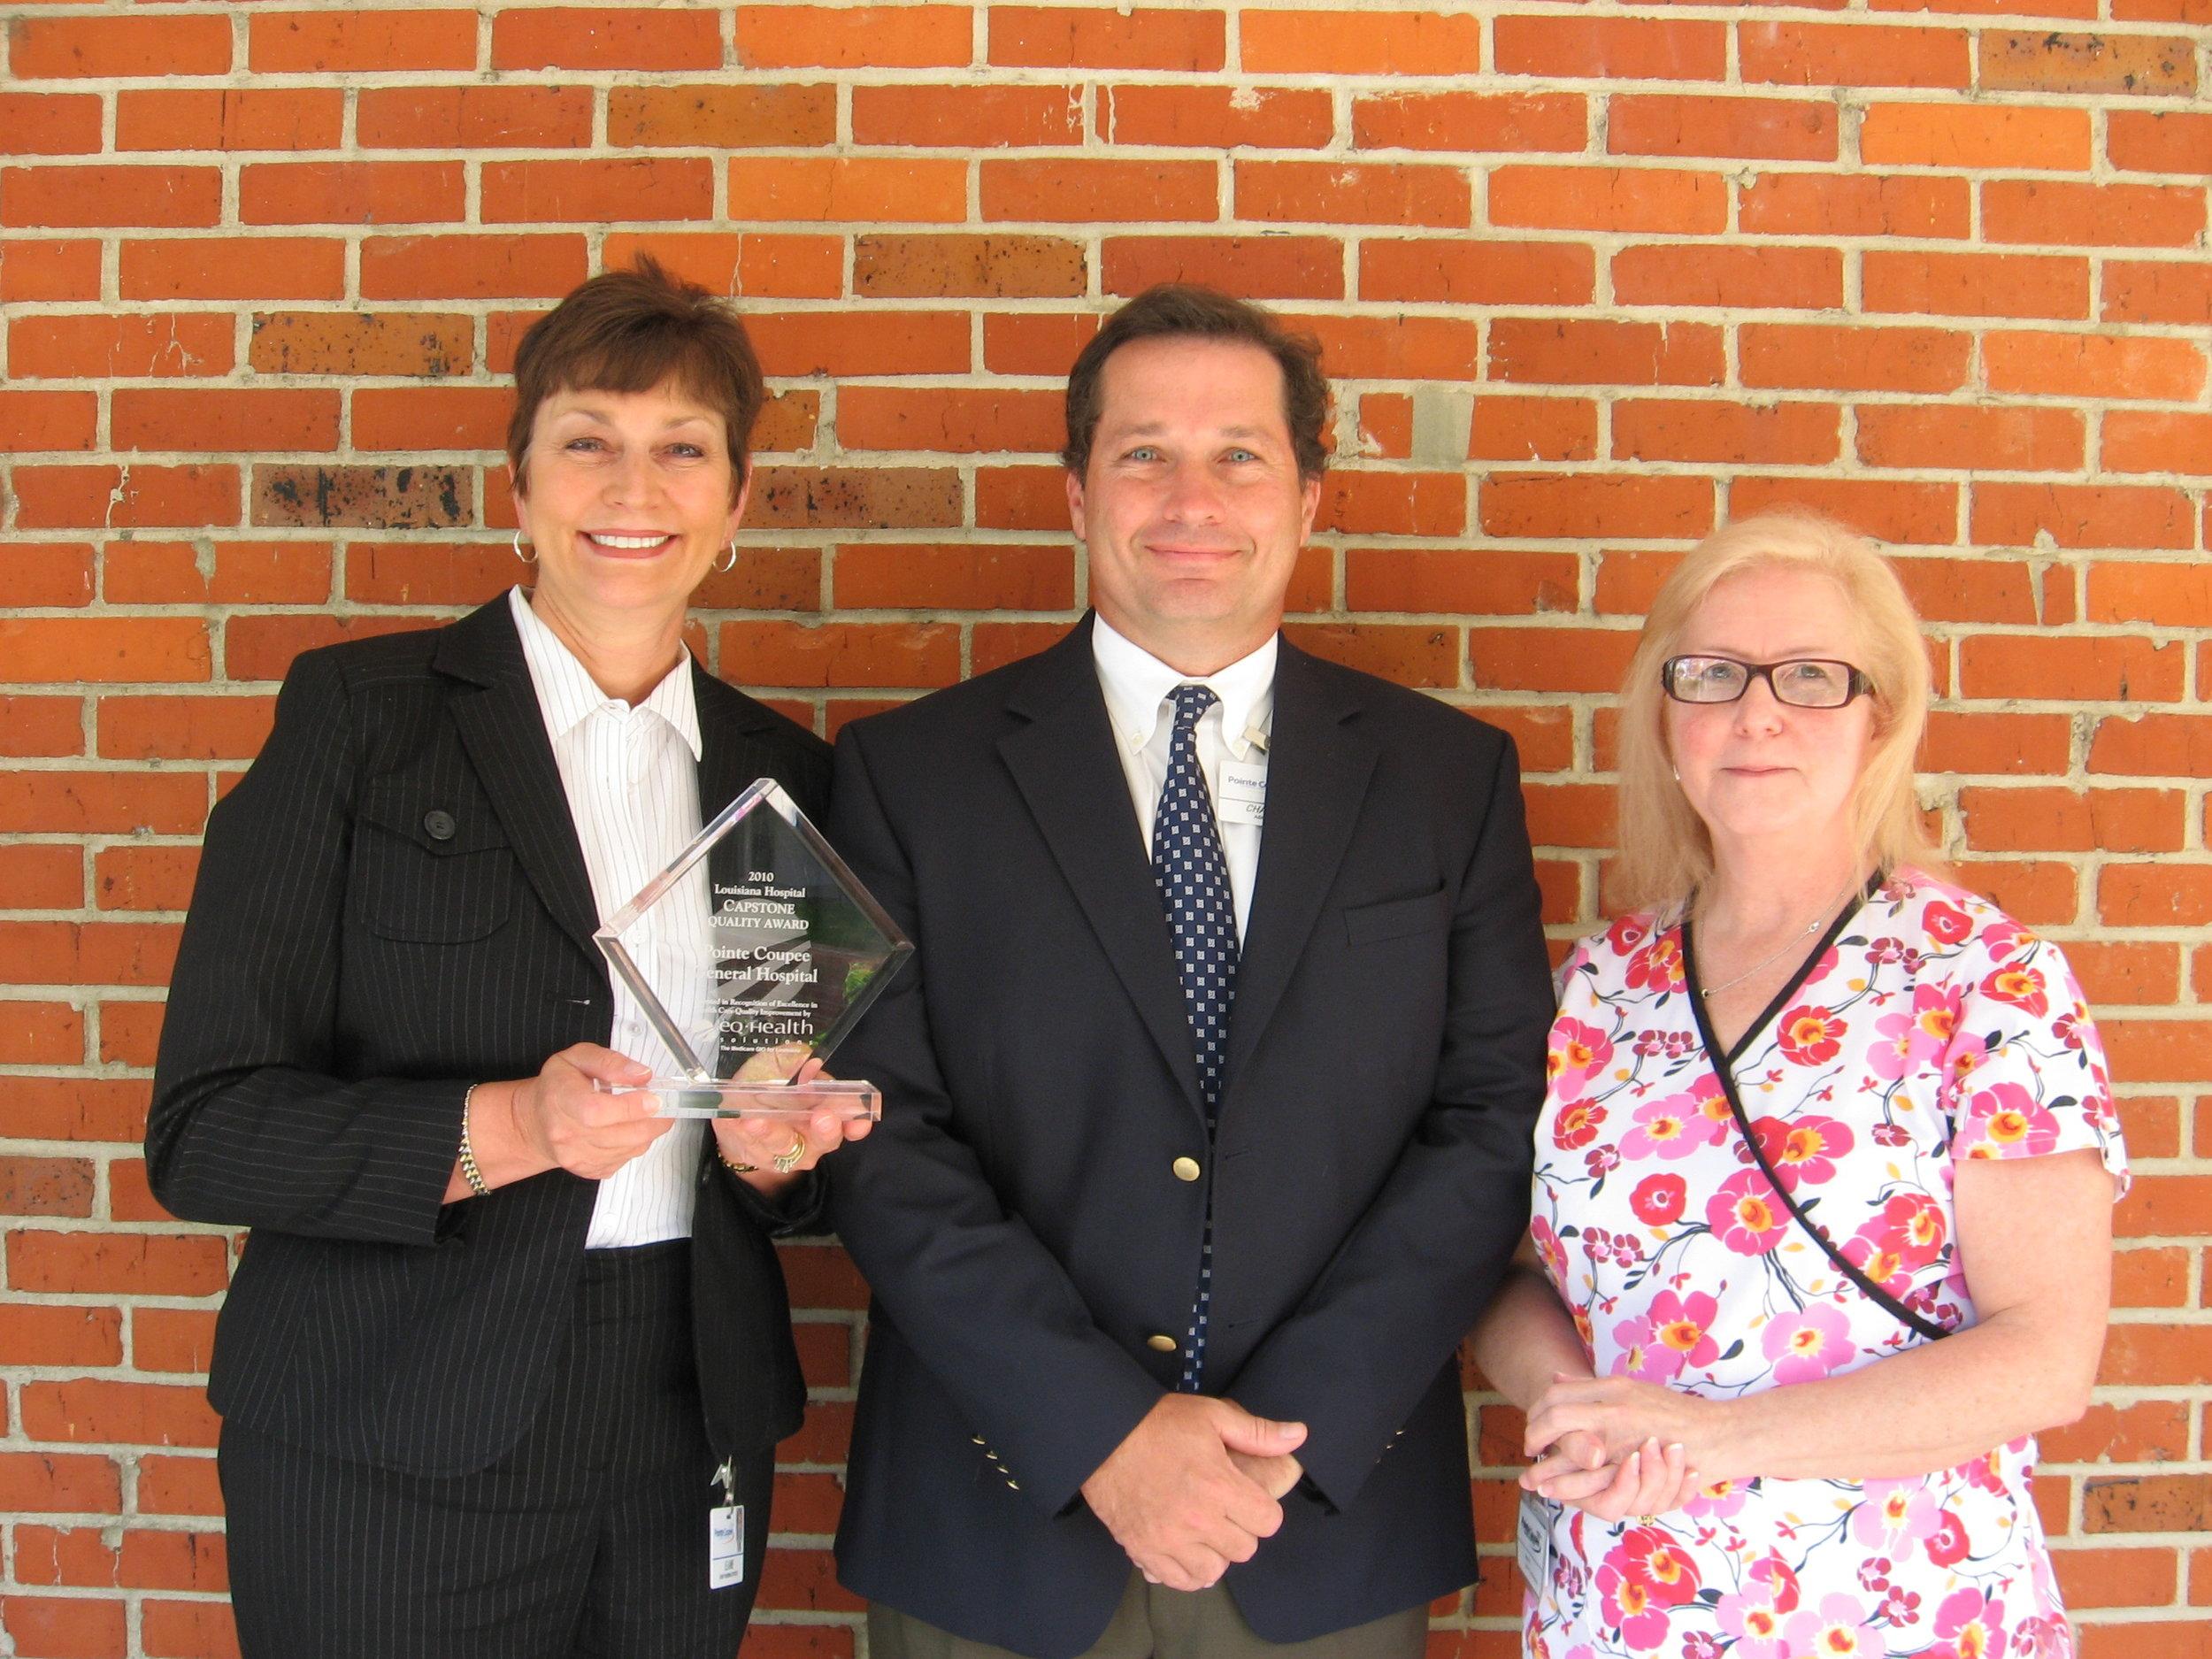 Elaine Hurme, Chad Olinde, and Maggie Jarreau showcase PCGH's Louisiana Hospital Capstone Quality award.